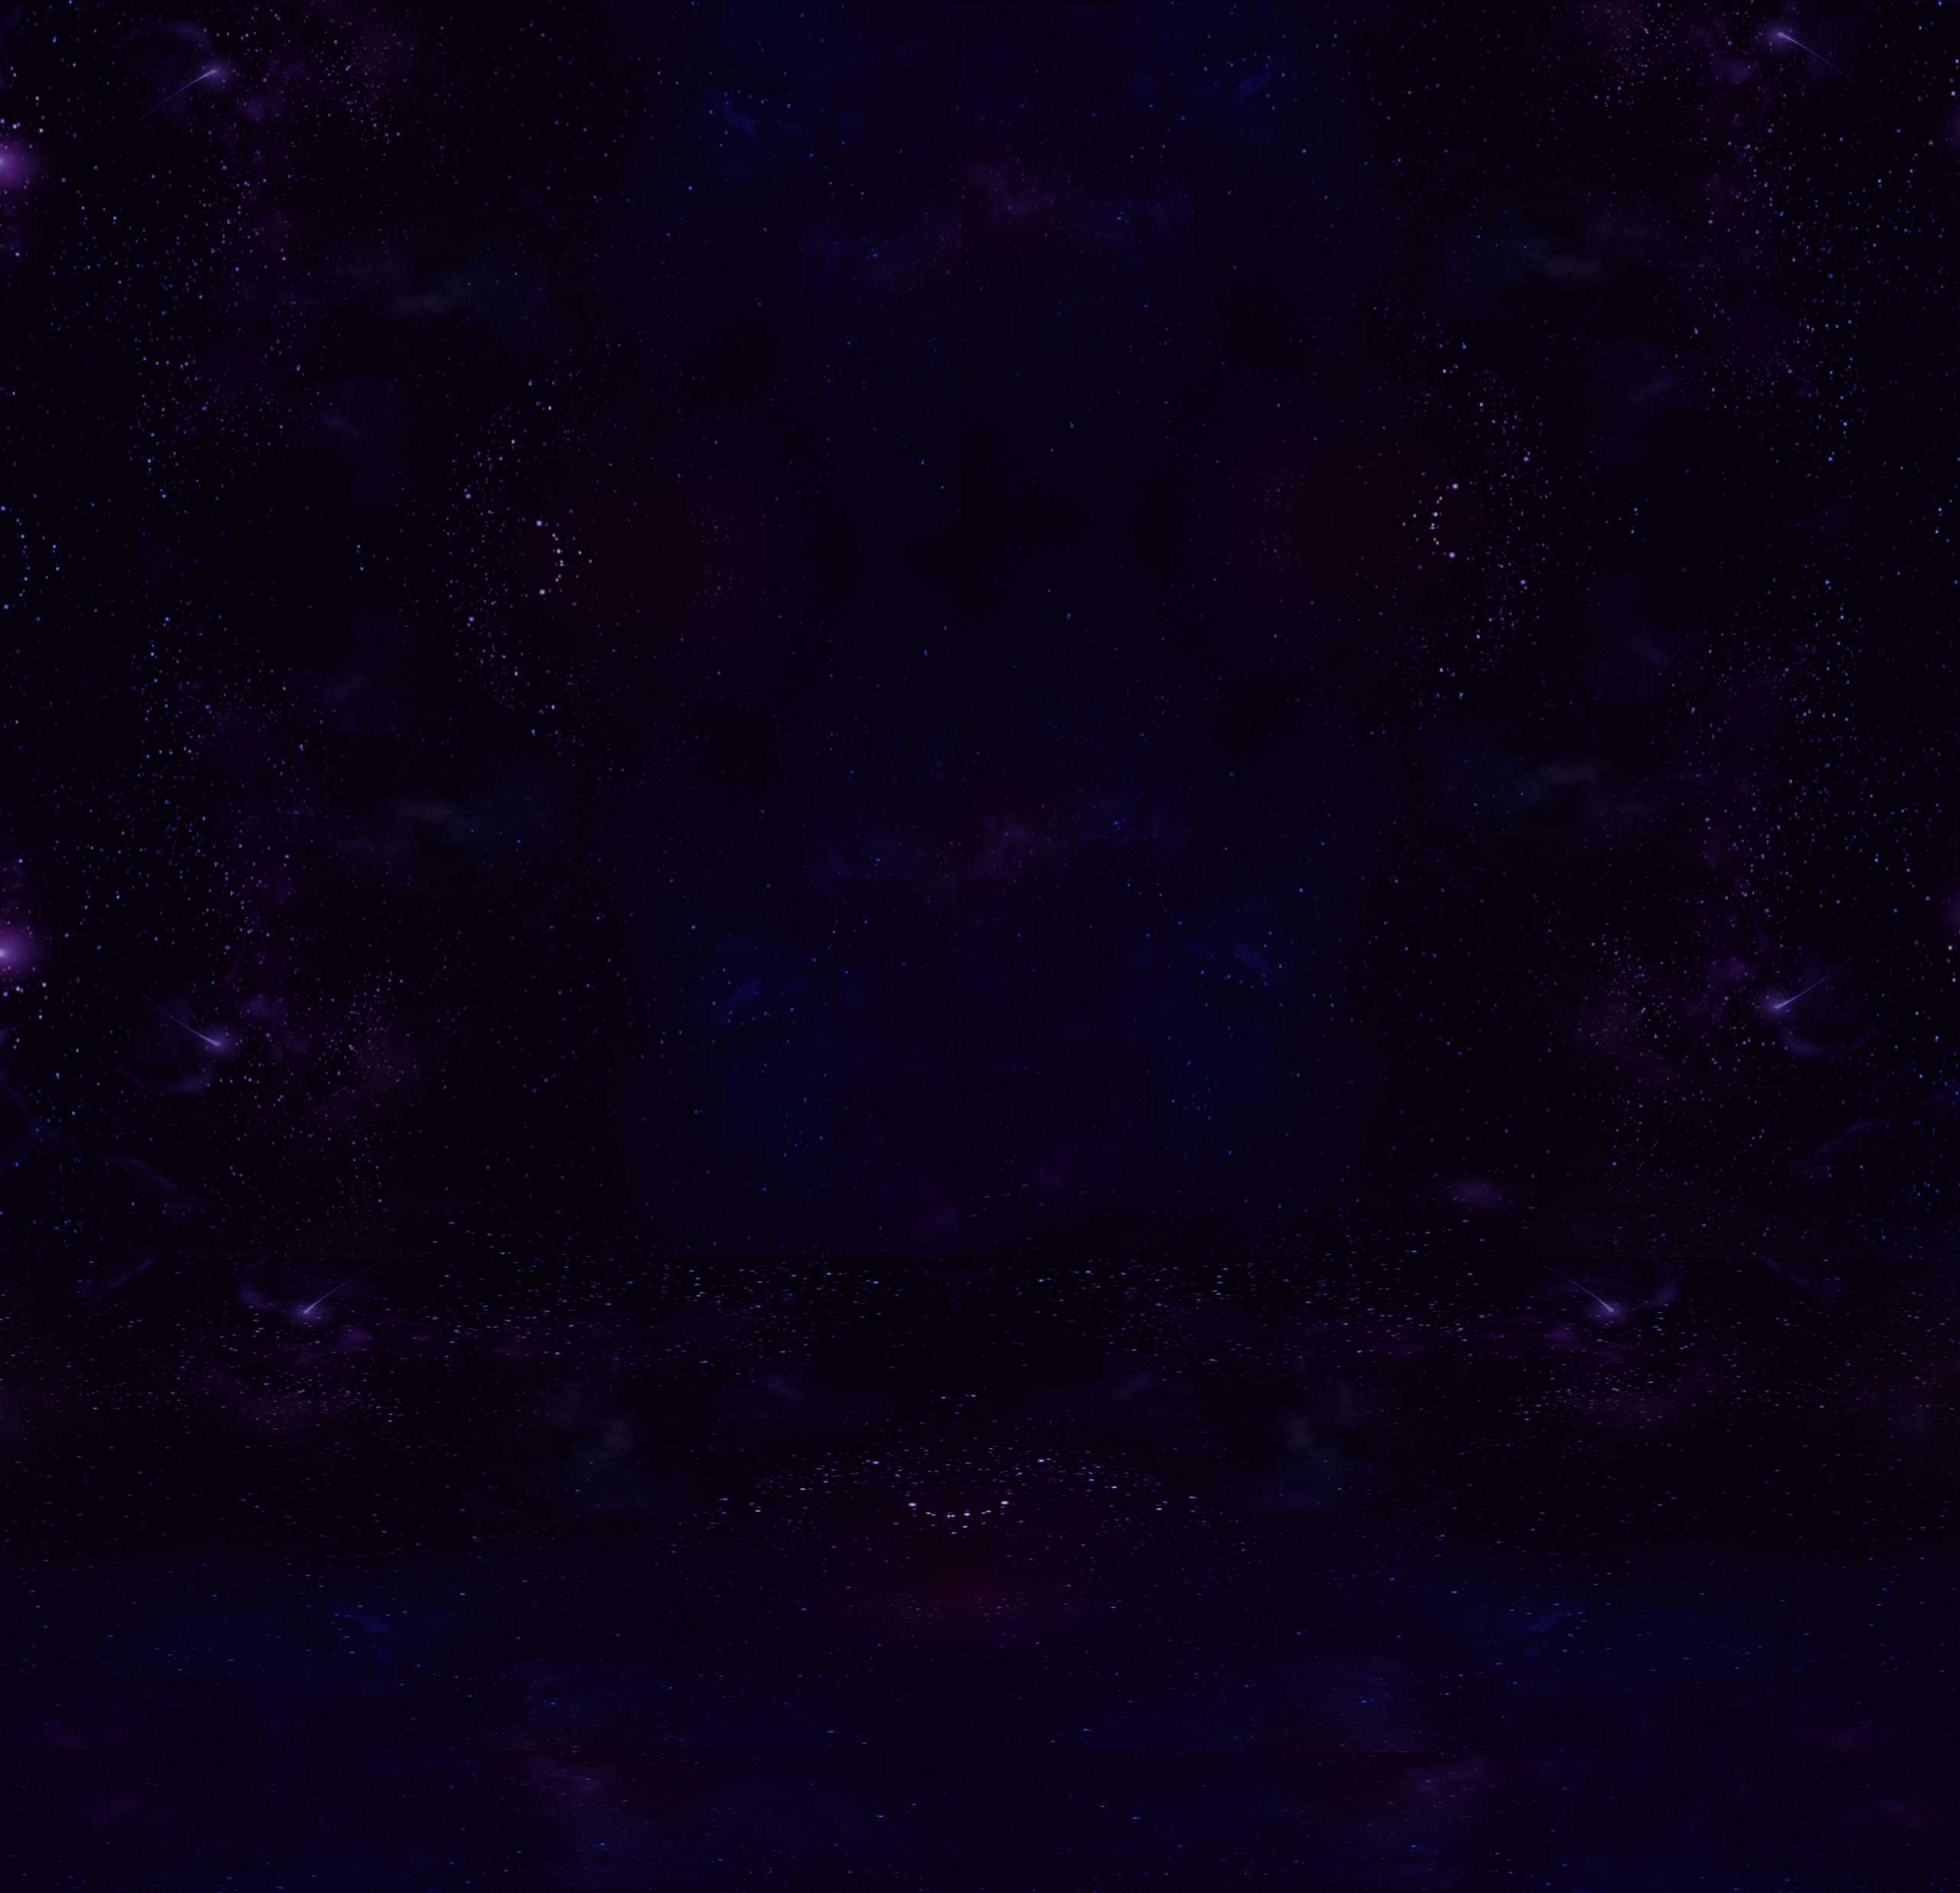 OPPO F9 Starry Purple Edition - The Innovative and Unique Purple